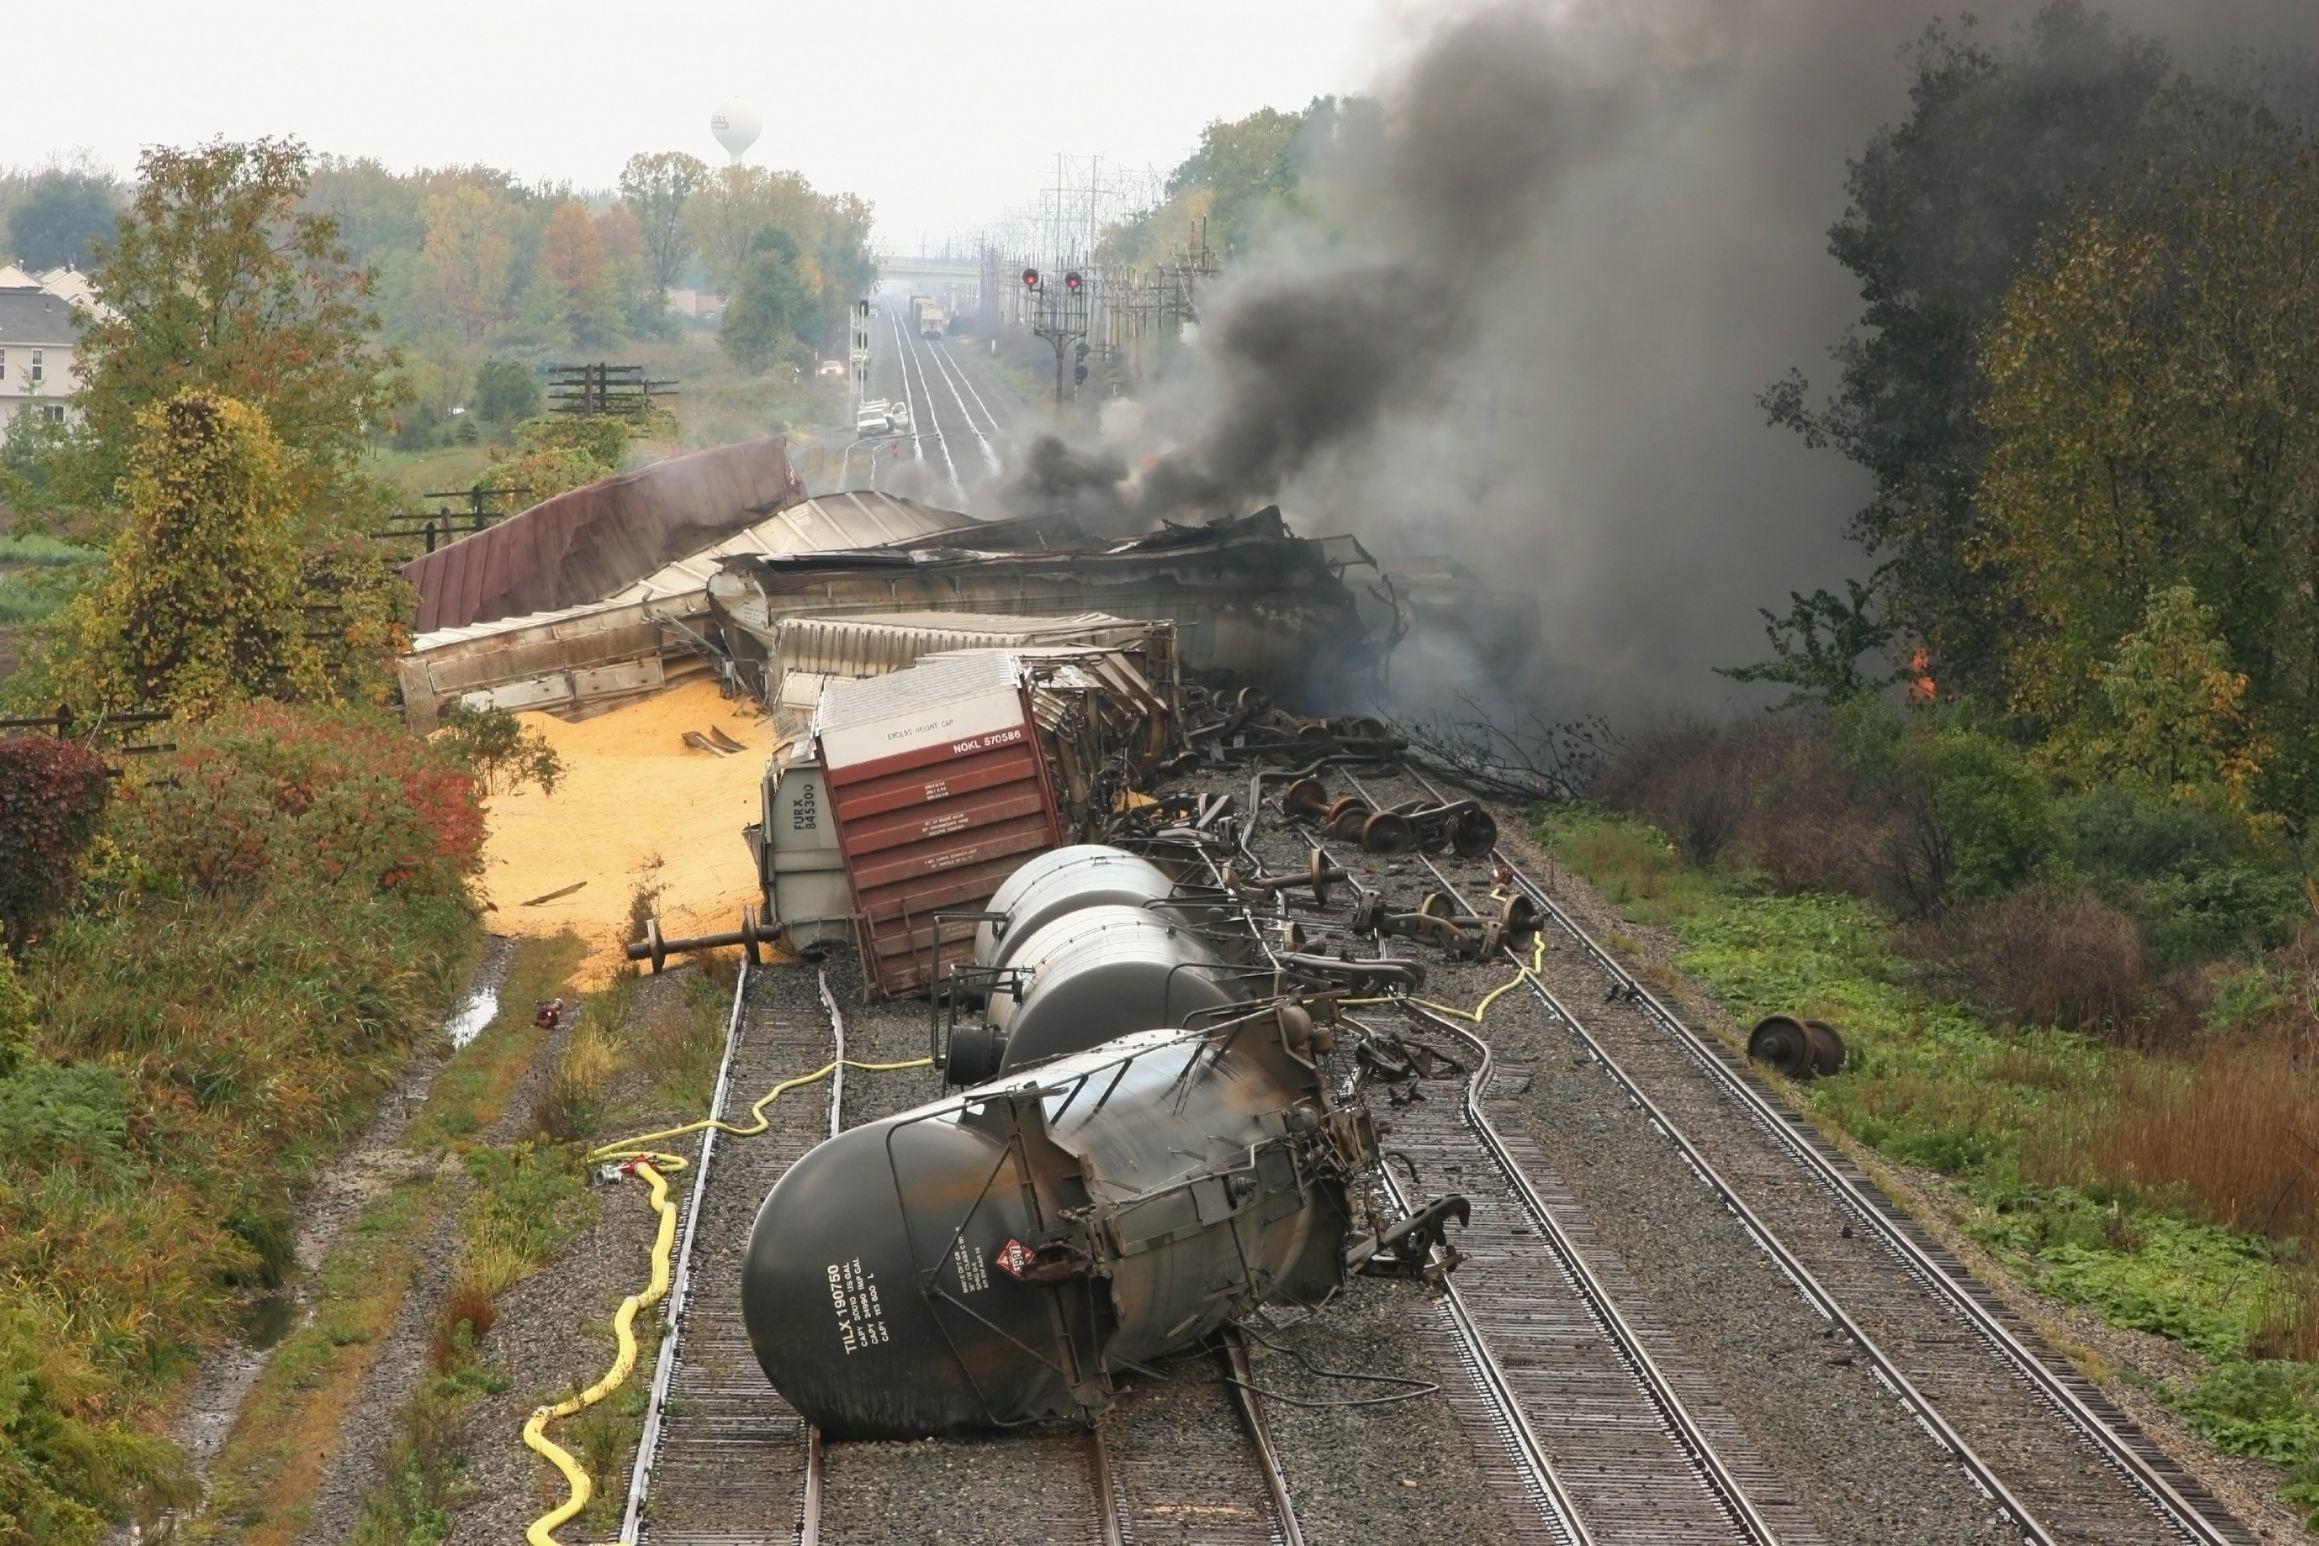 Train wreck Blank Template - Imgflip